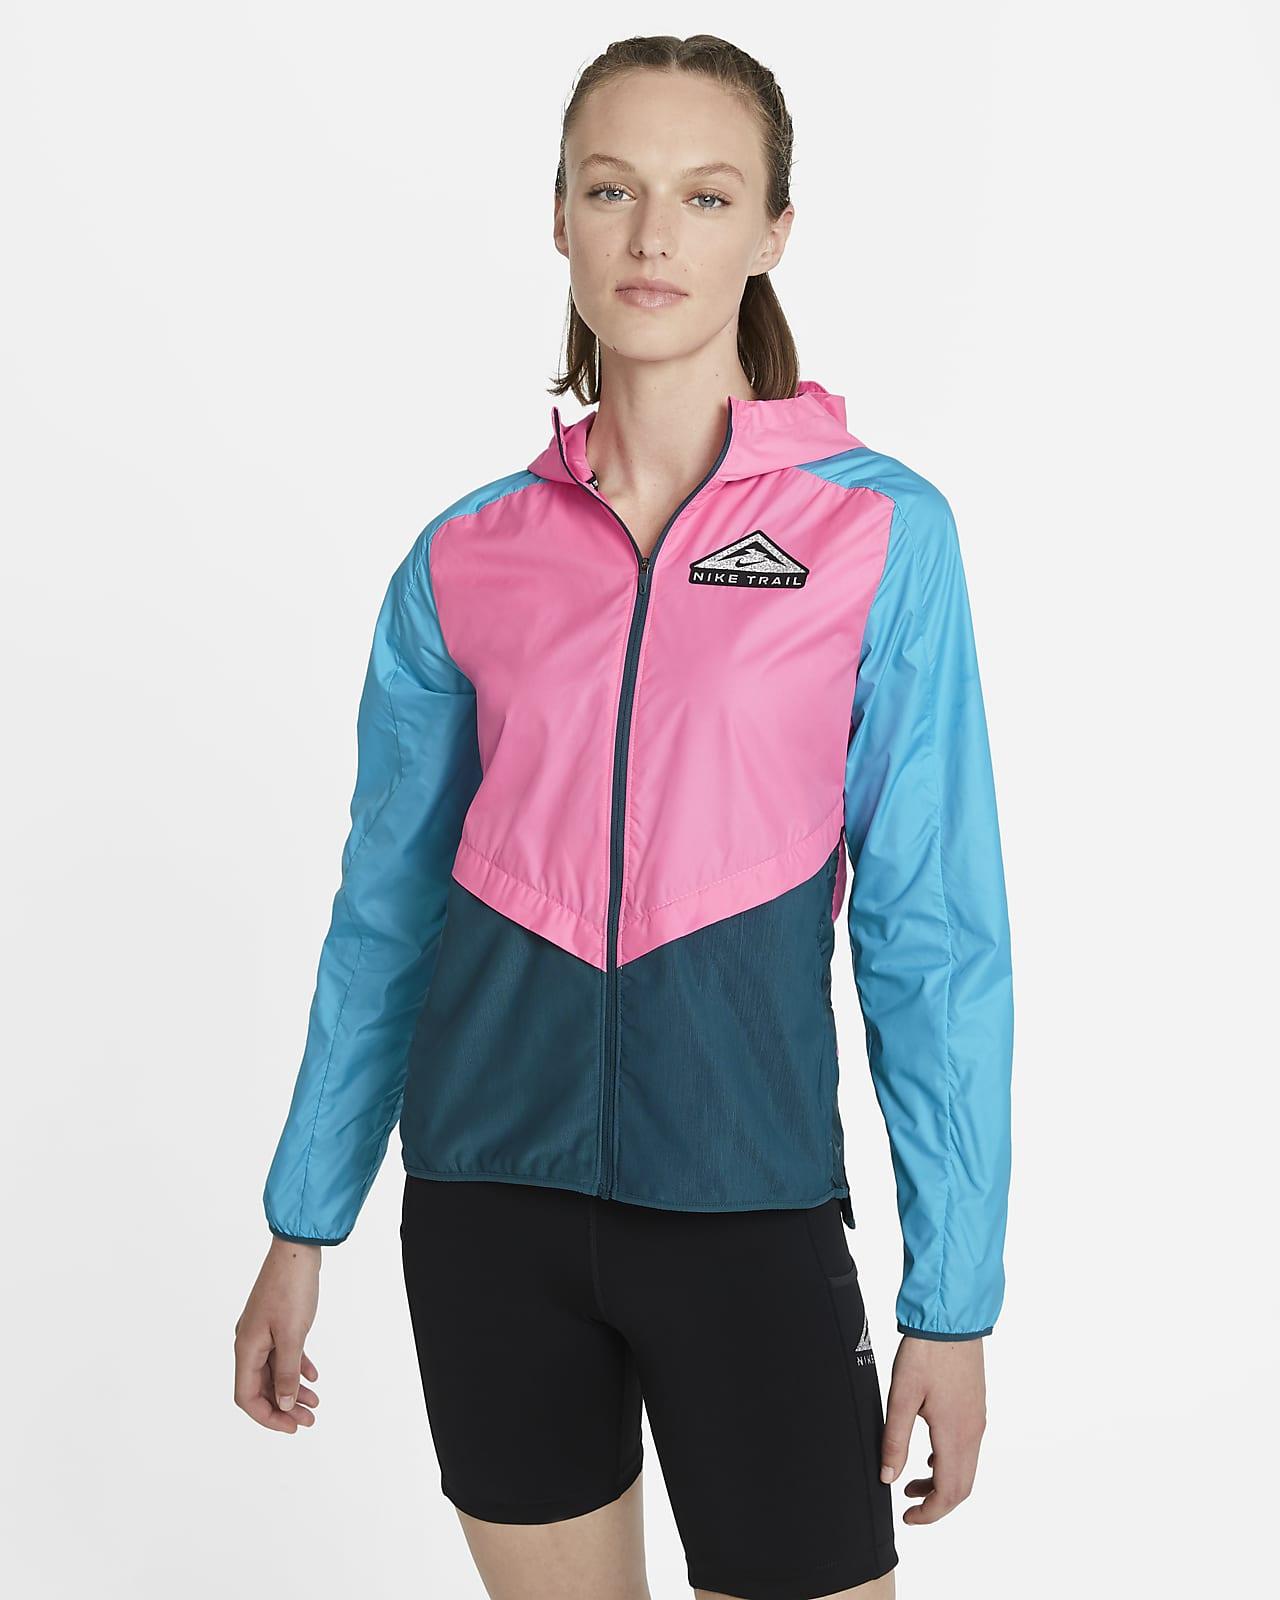 Chamarra para carreras de sendero para mujer Nike Shield